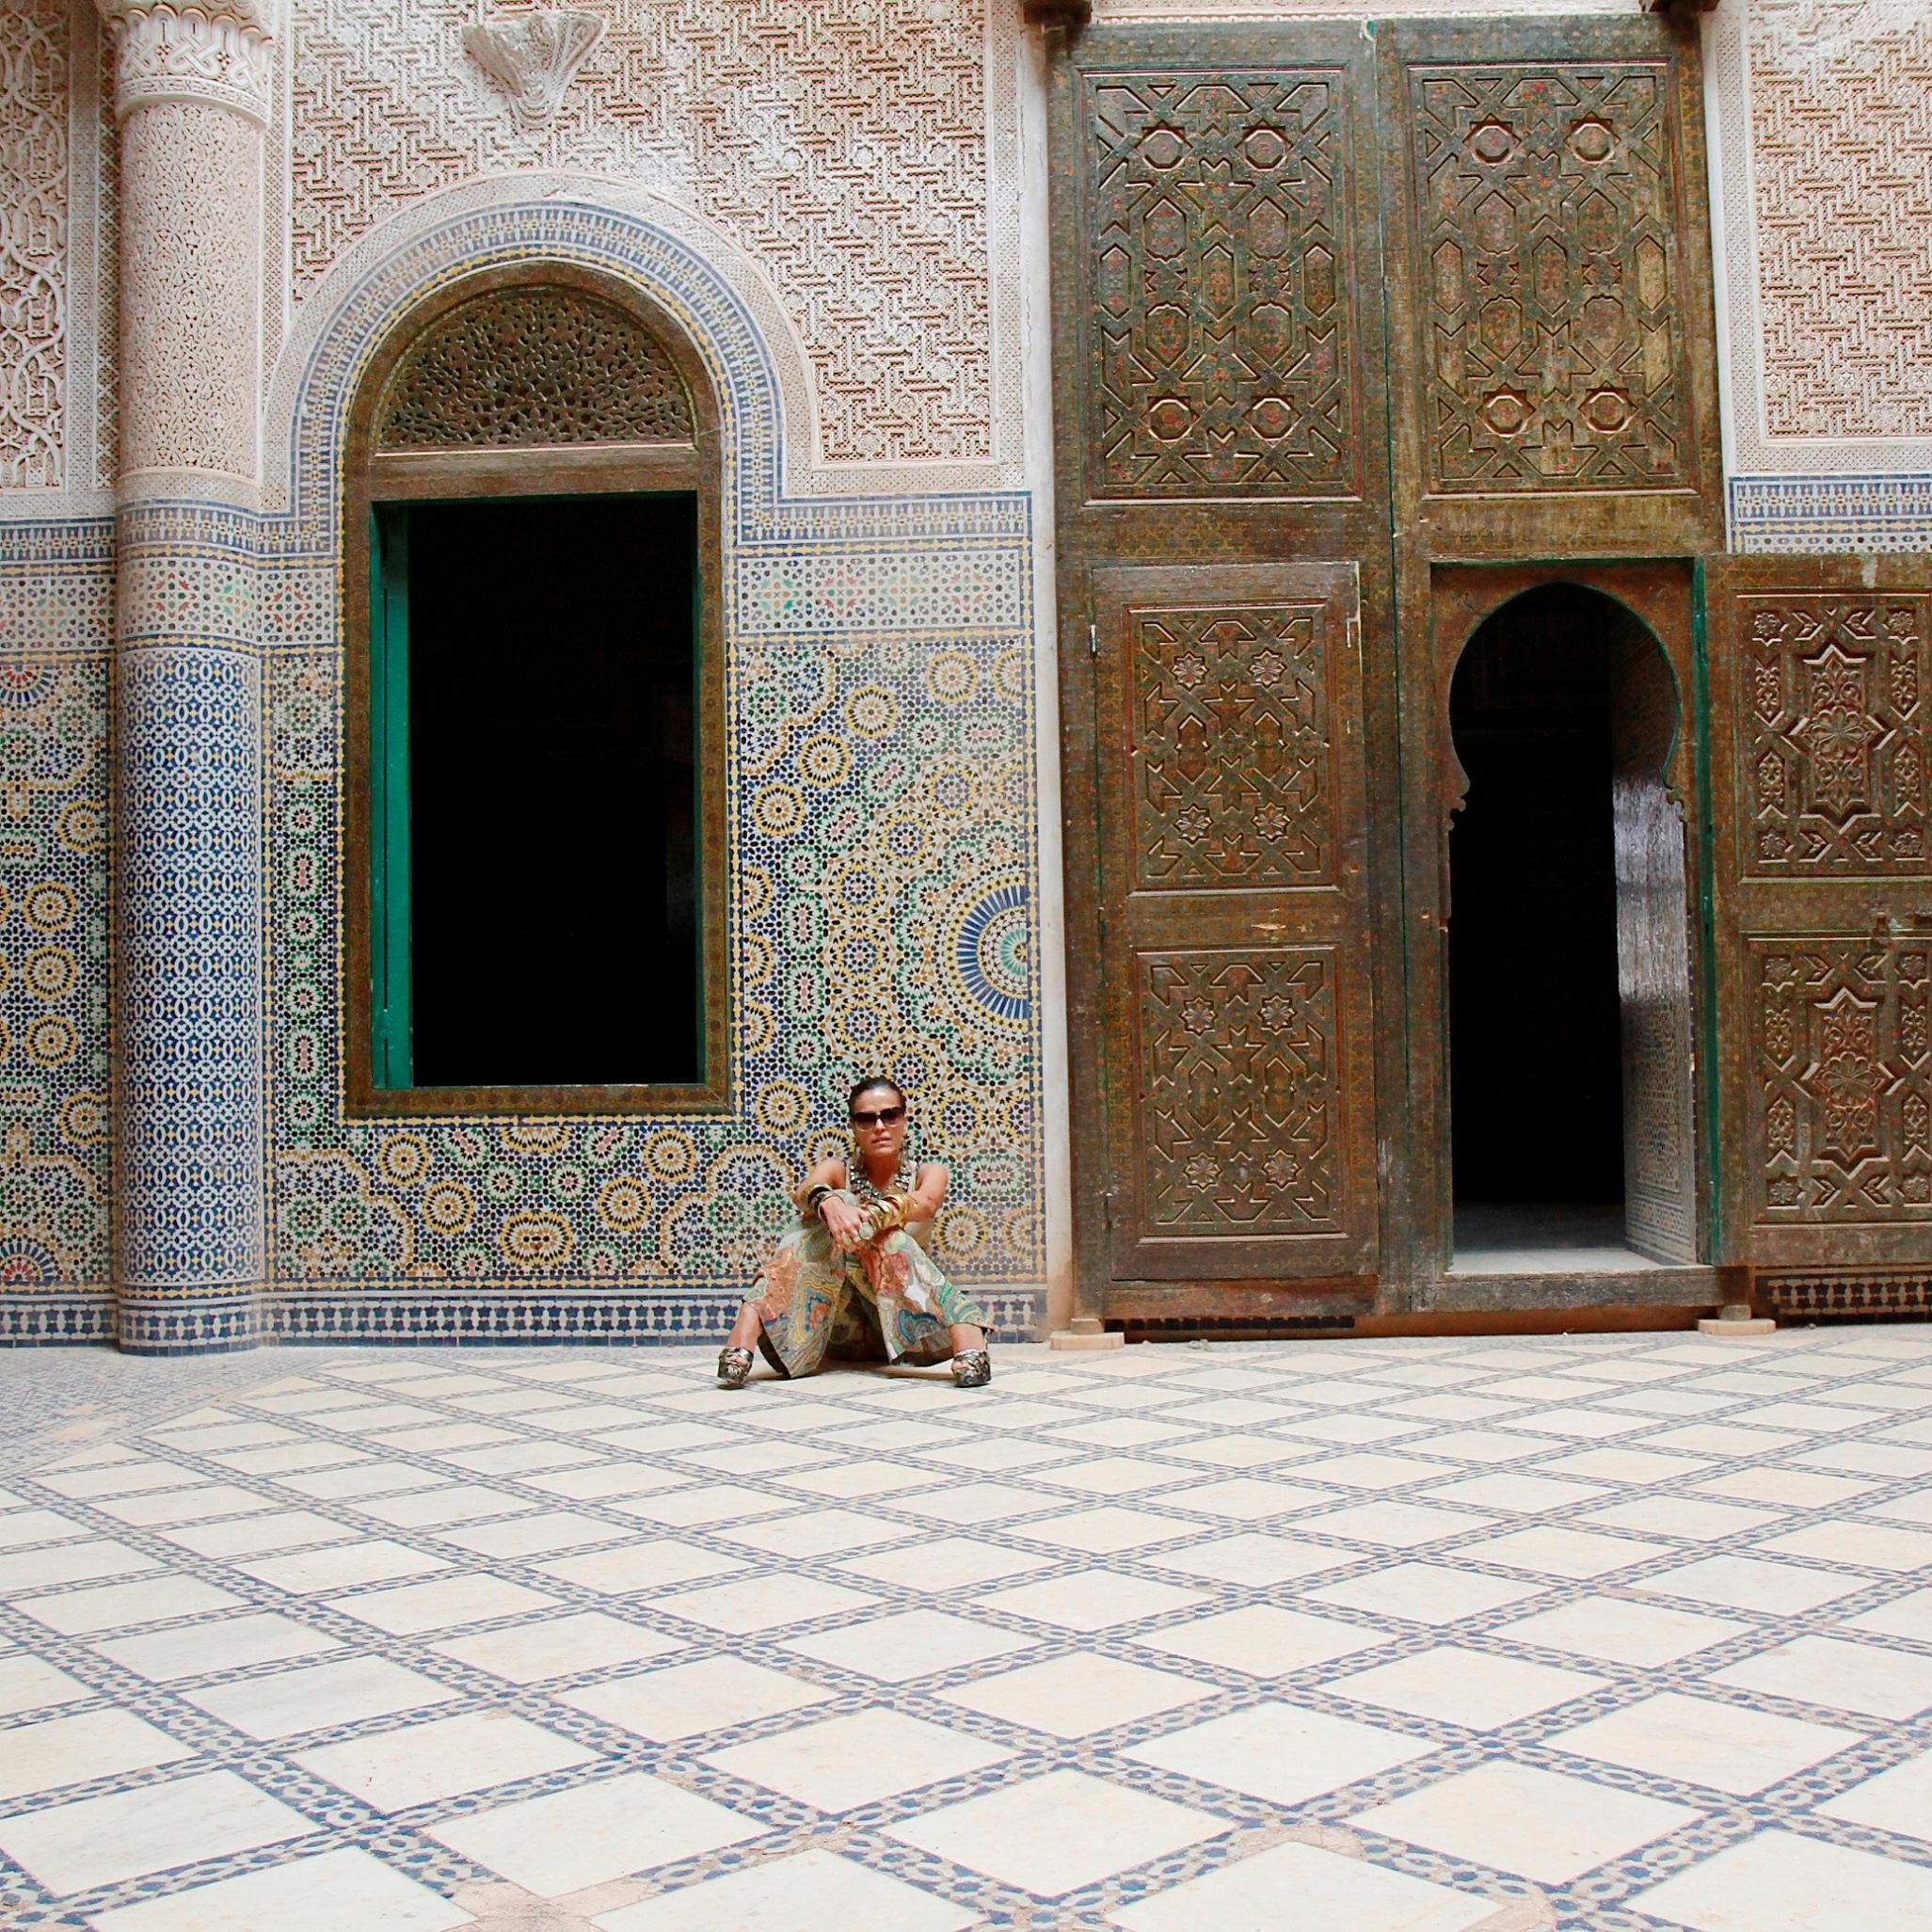 Cerámicas de Marruecos para inspirar mesa de diseño